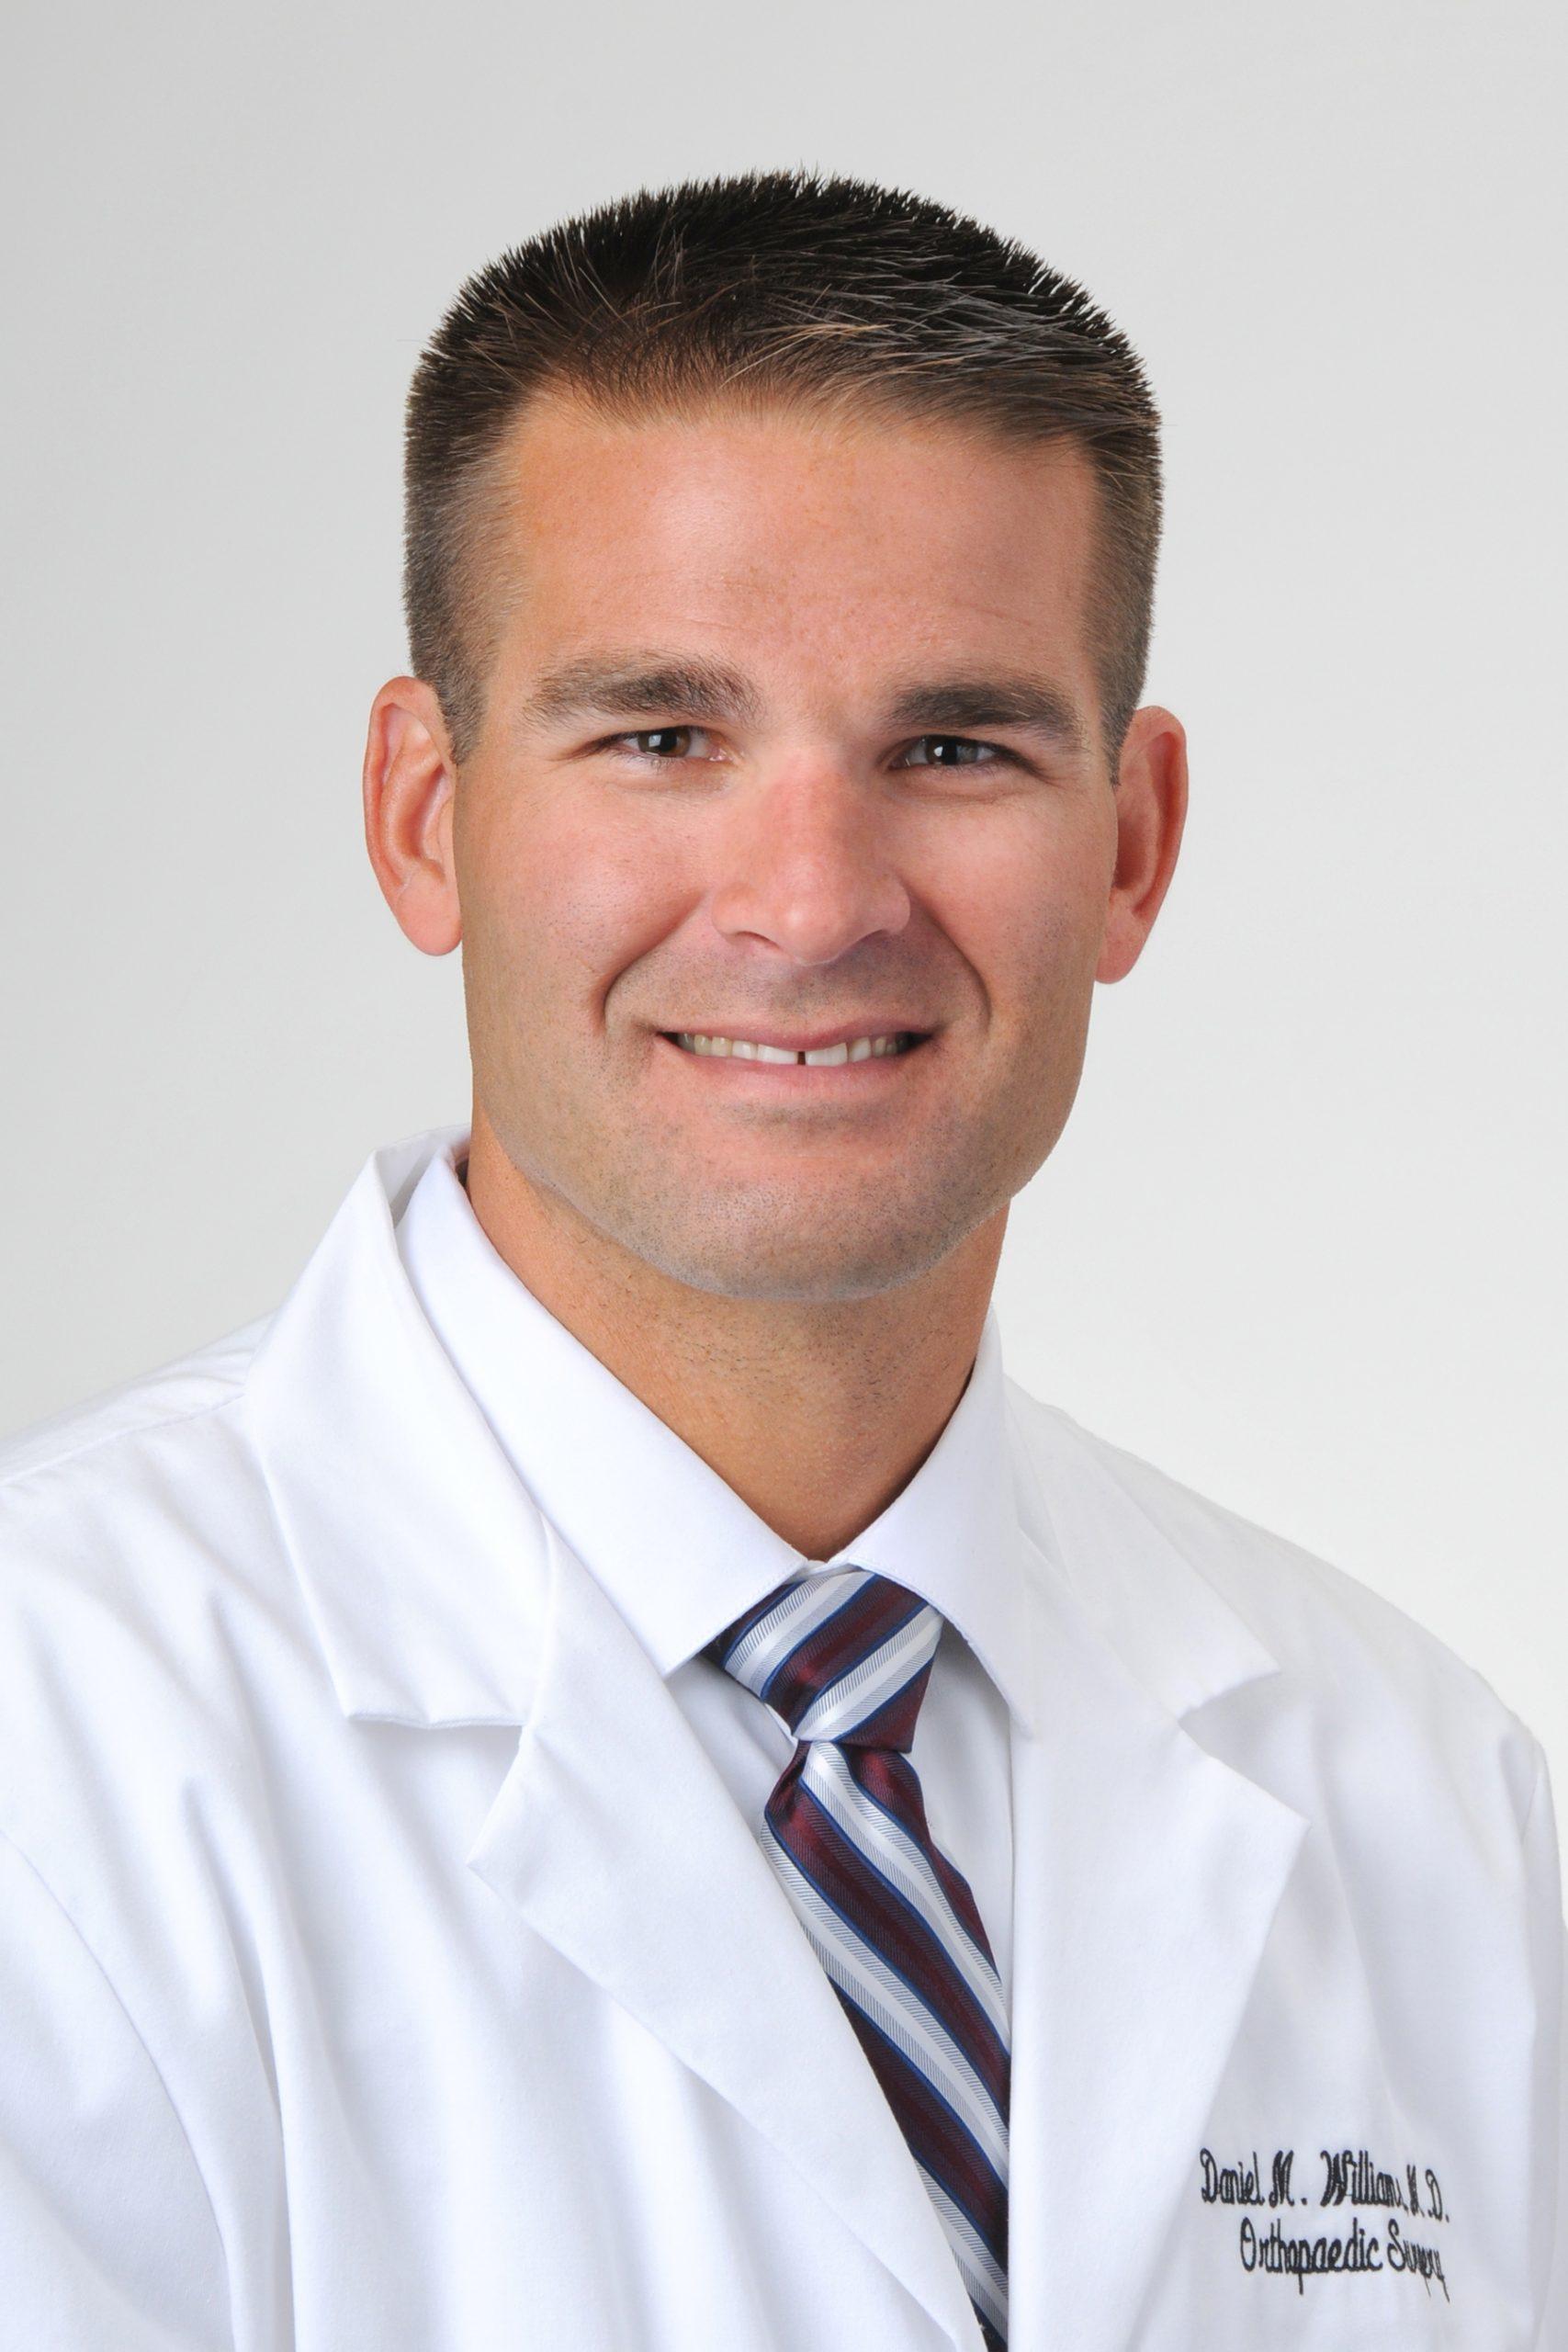 Daniel Williams Orthopaedic Surgery